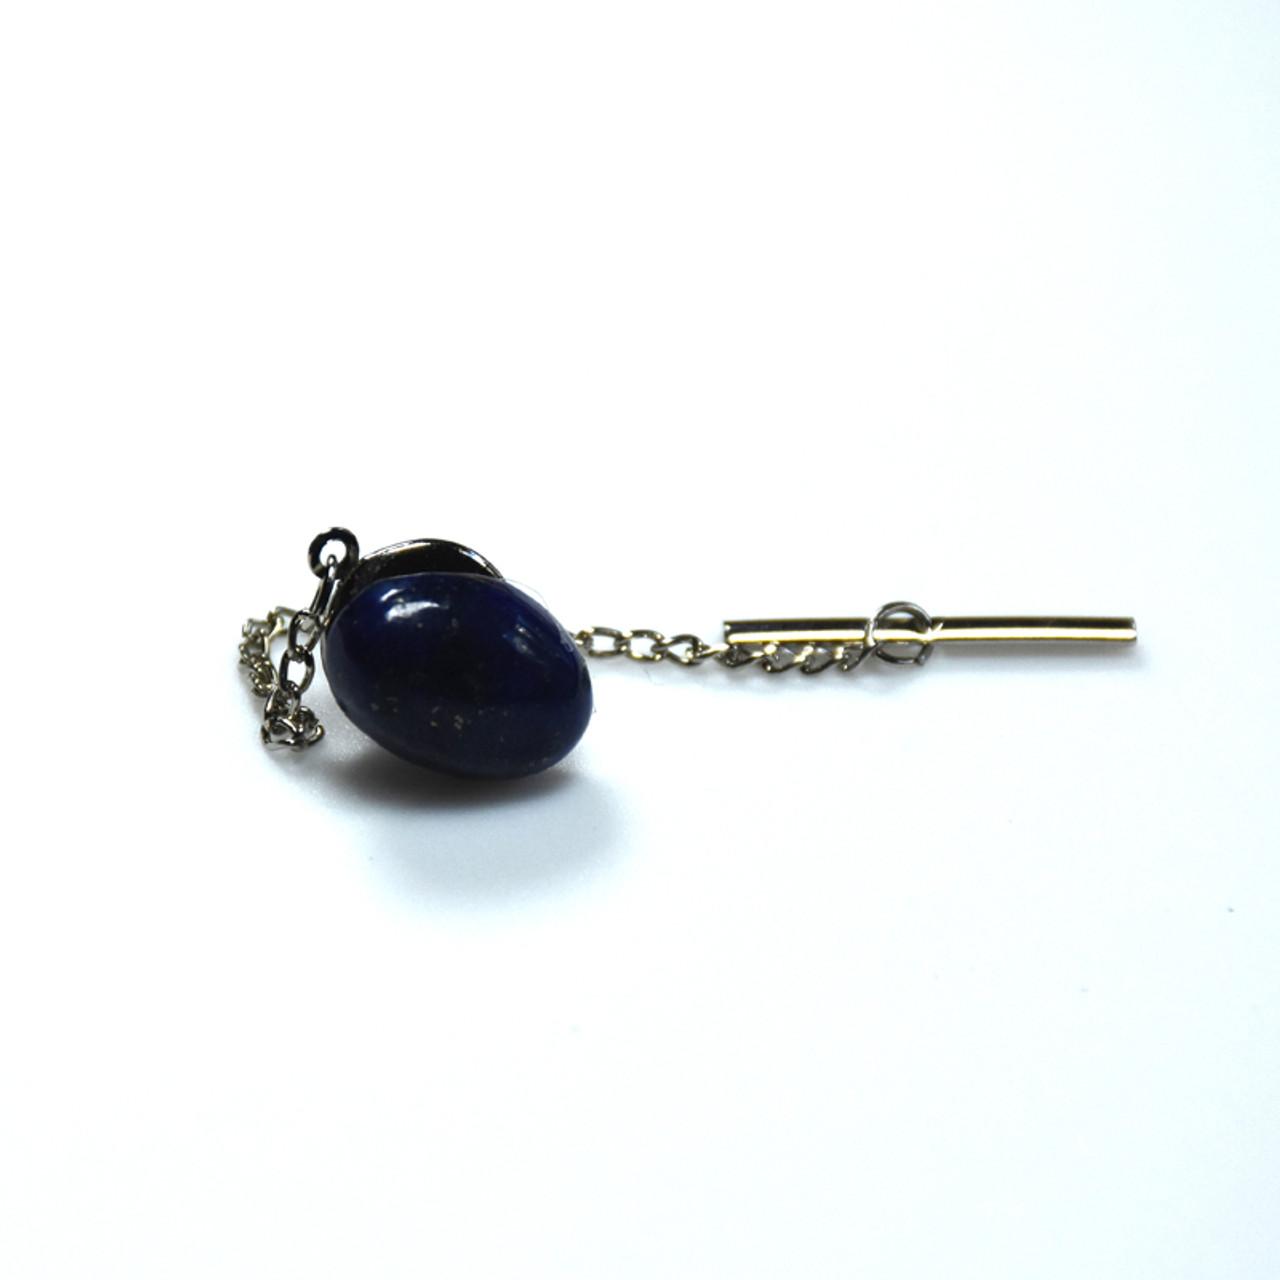 Lapis Lazuli Cabachon Tie Tack